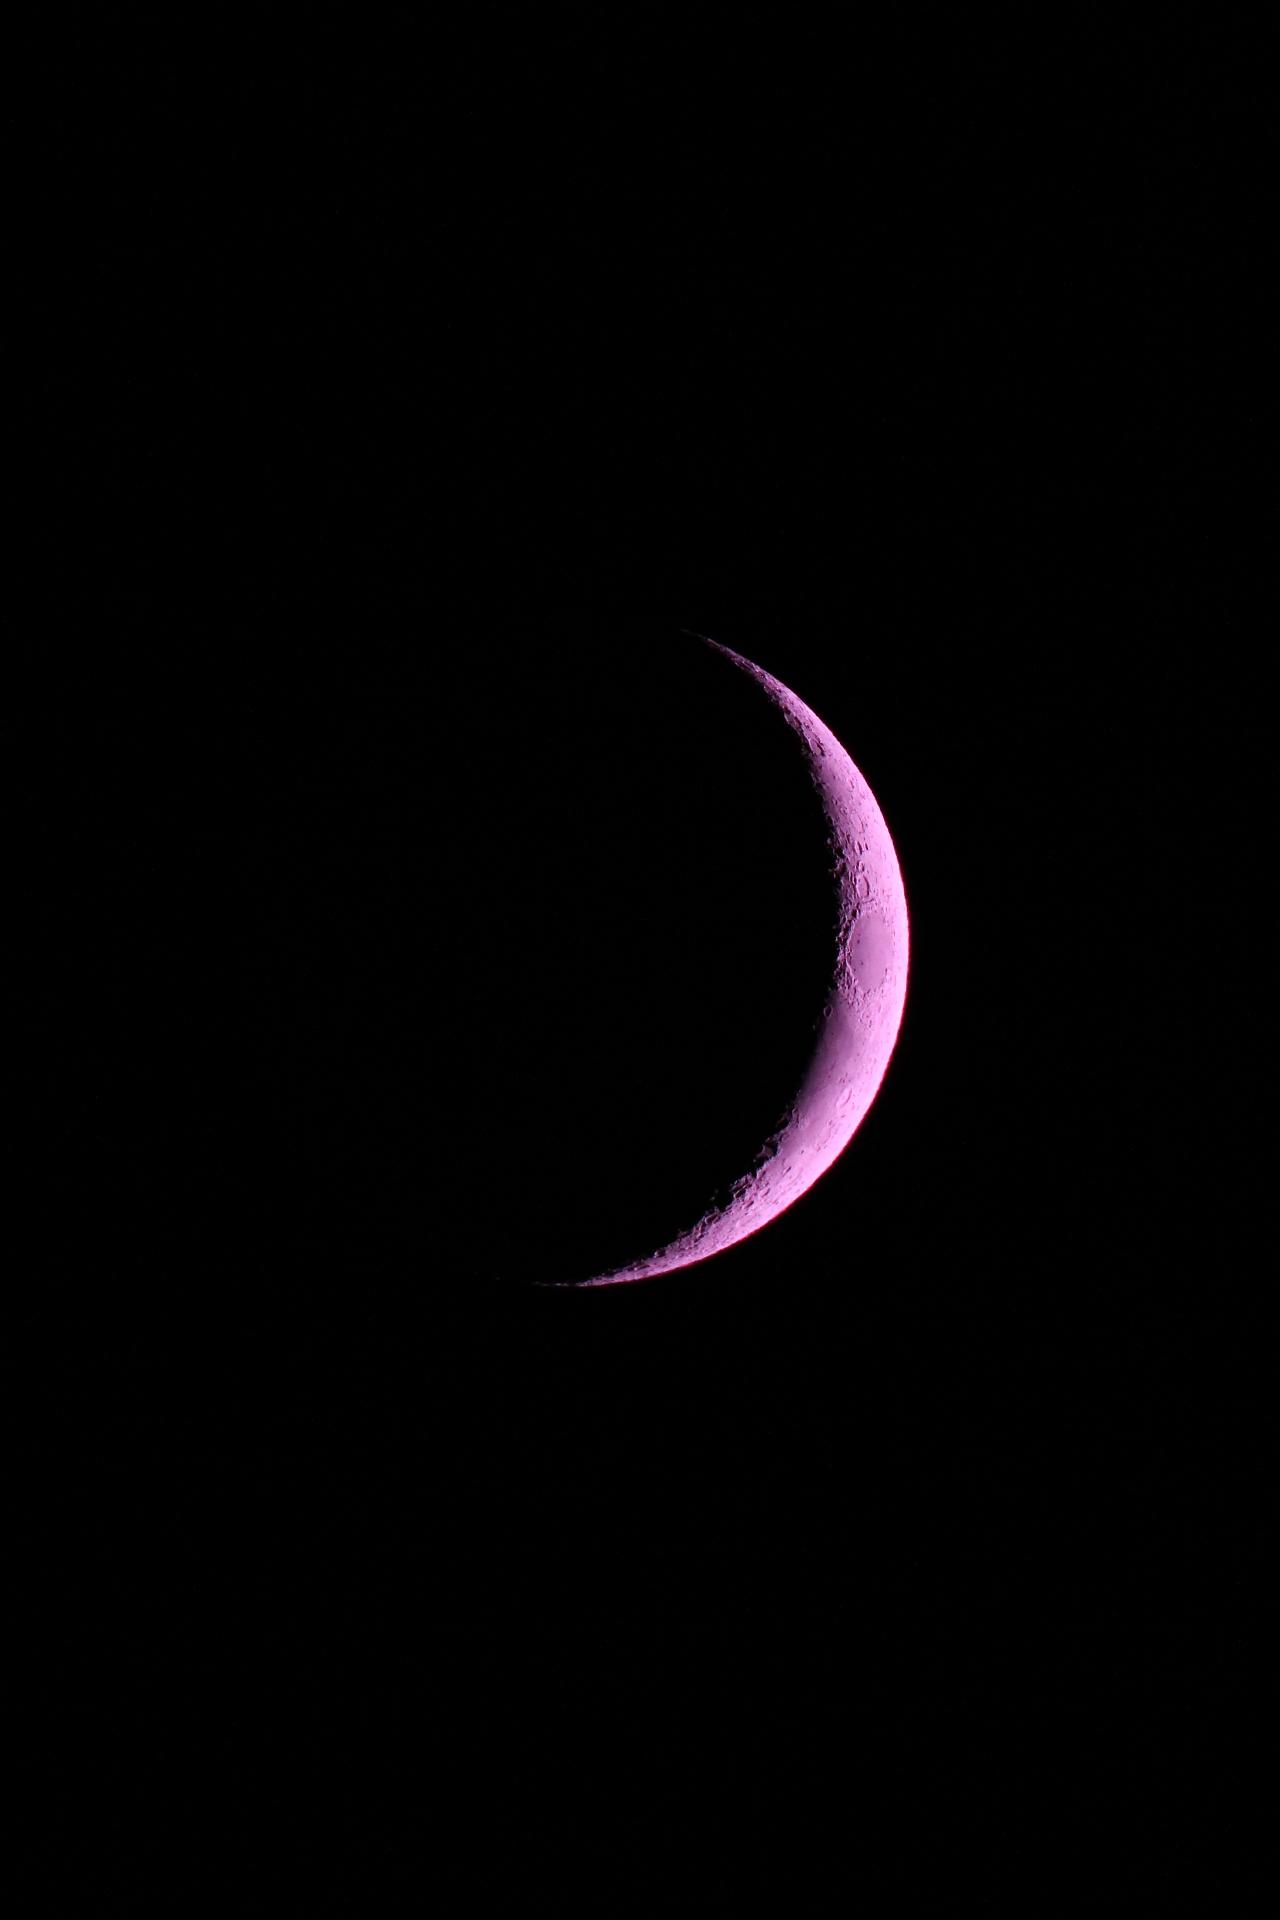 Waxing Crescent _Luc DELISLE